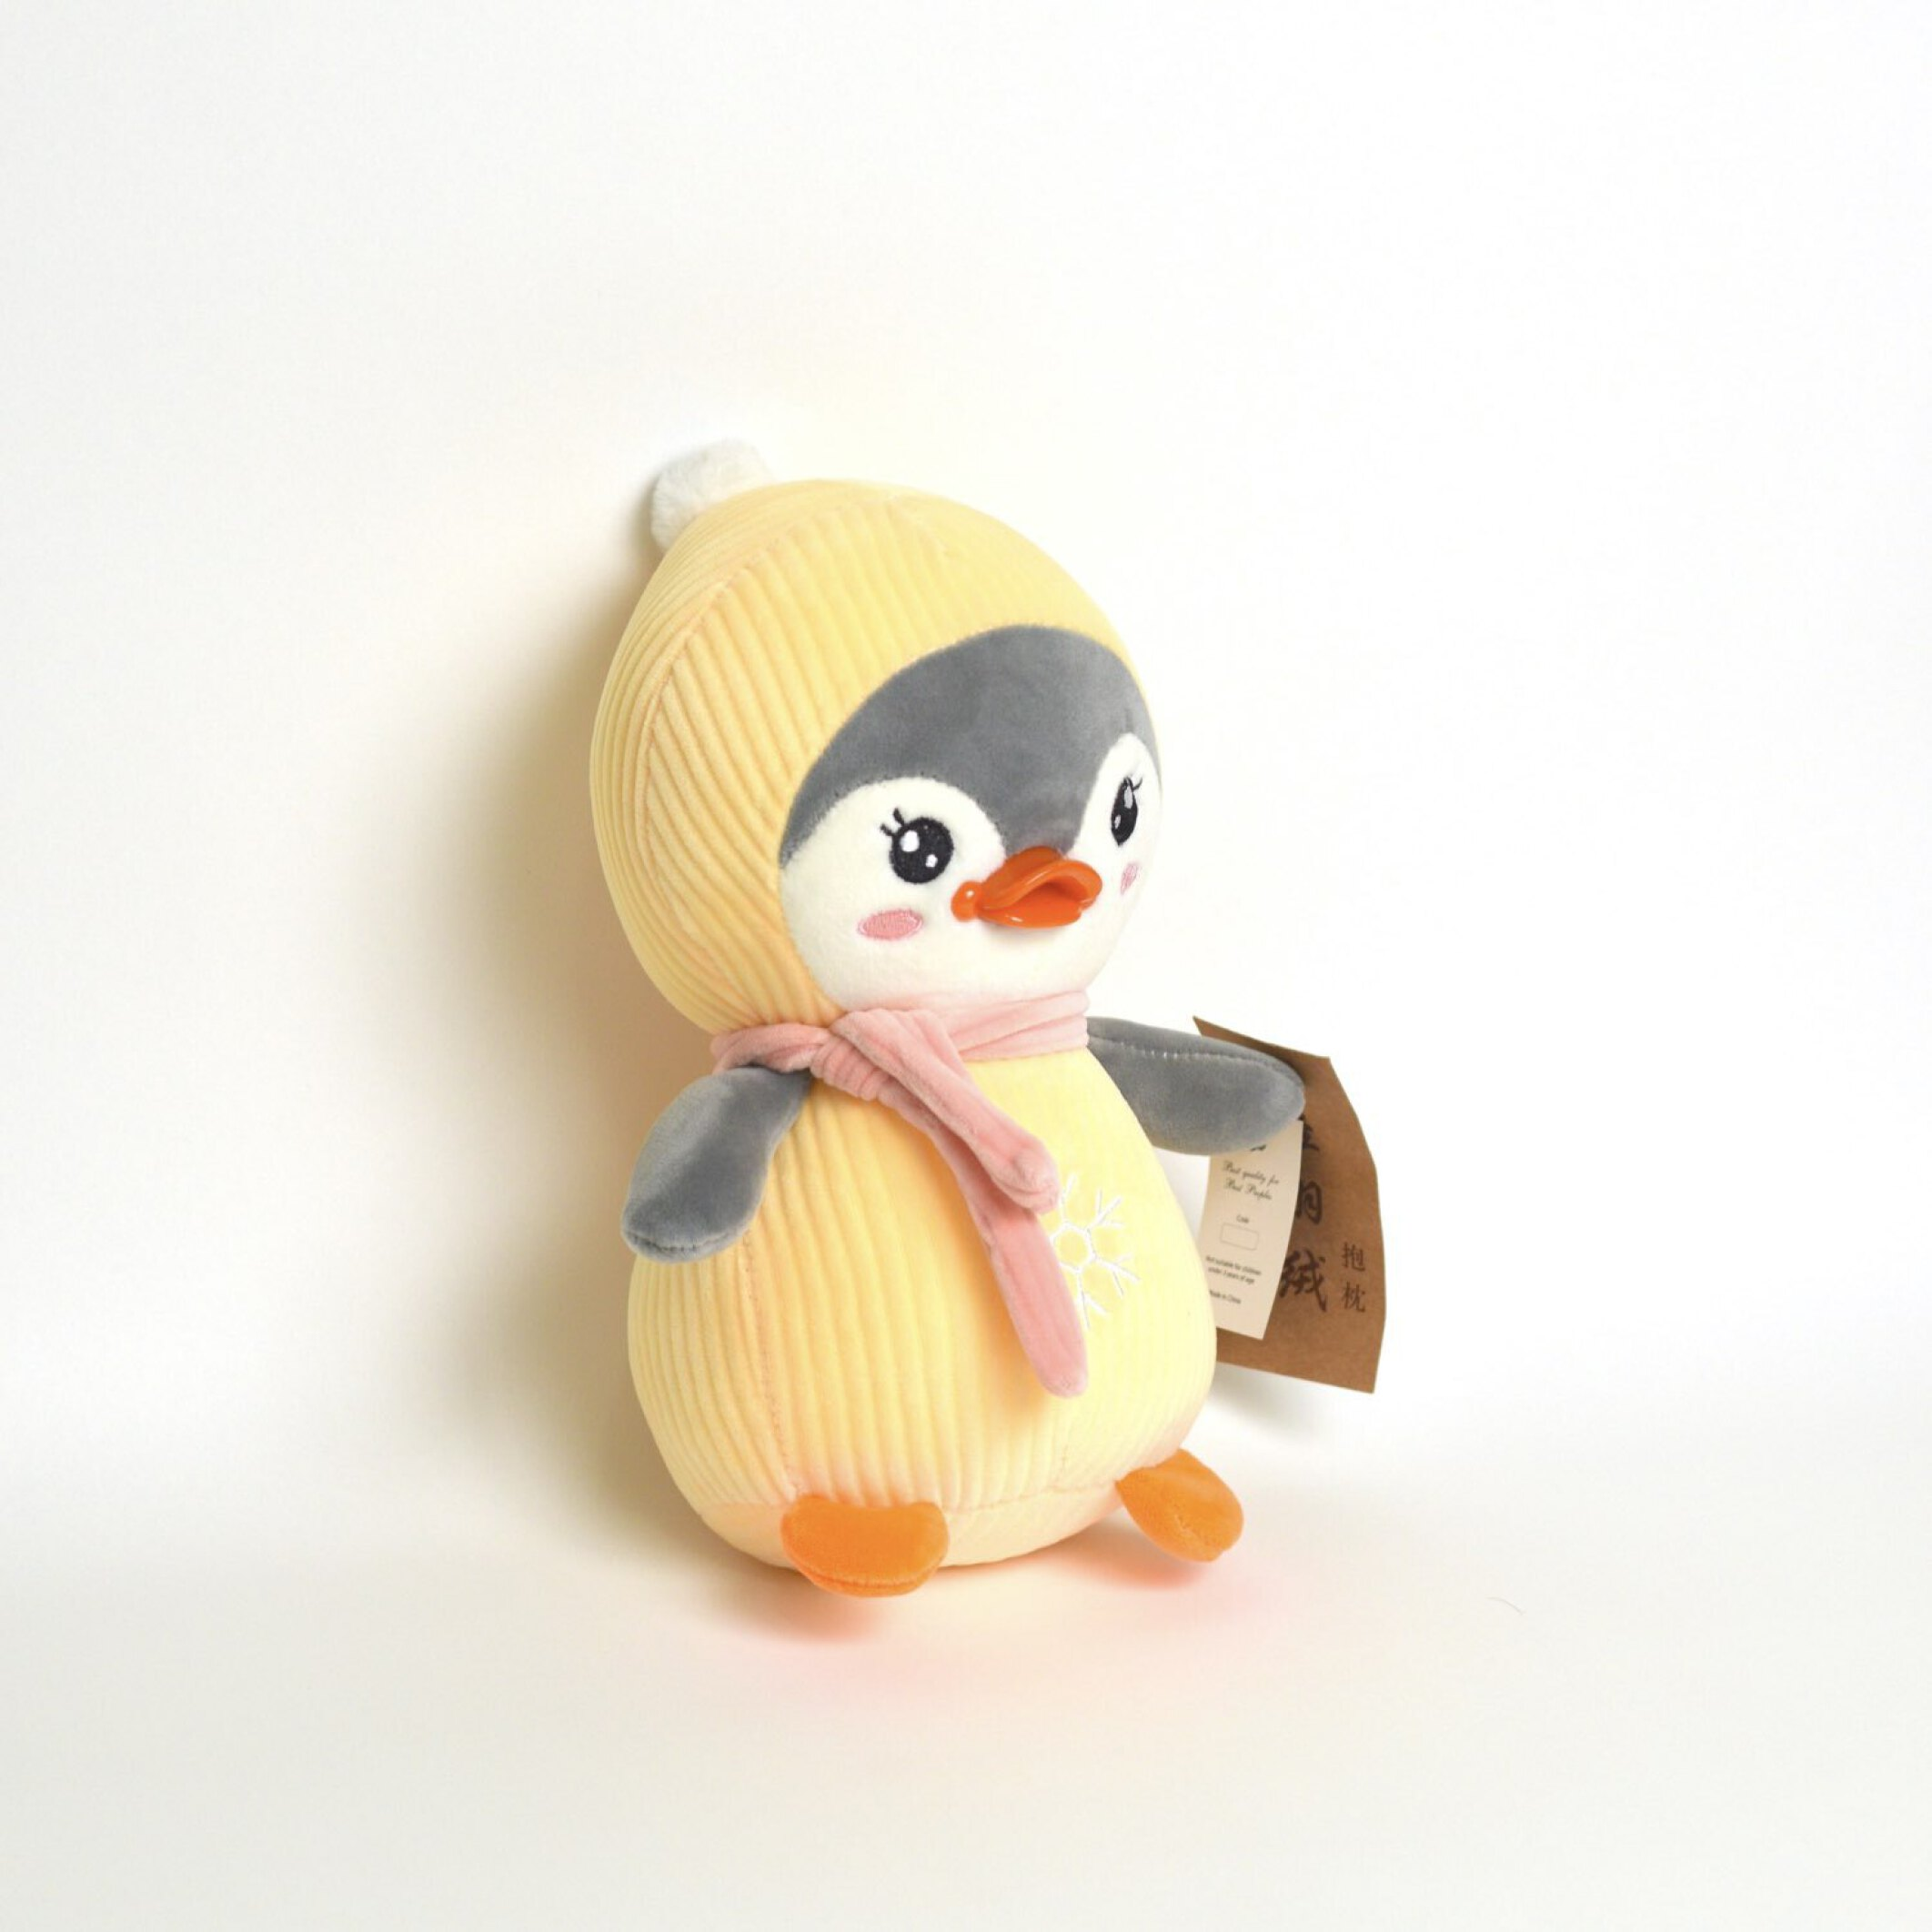 عروسک پولیشی پنگوئن با شال گردن